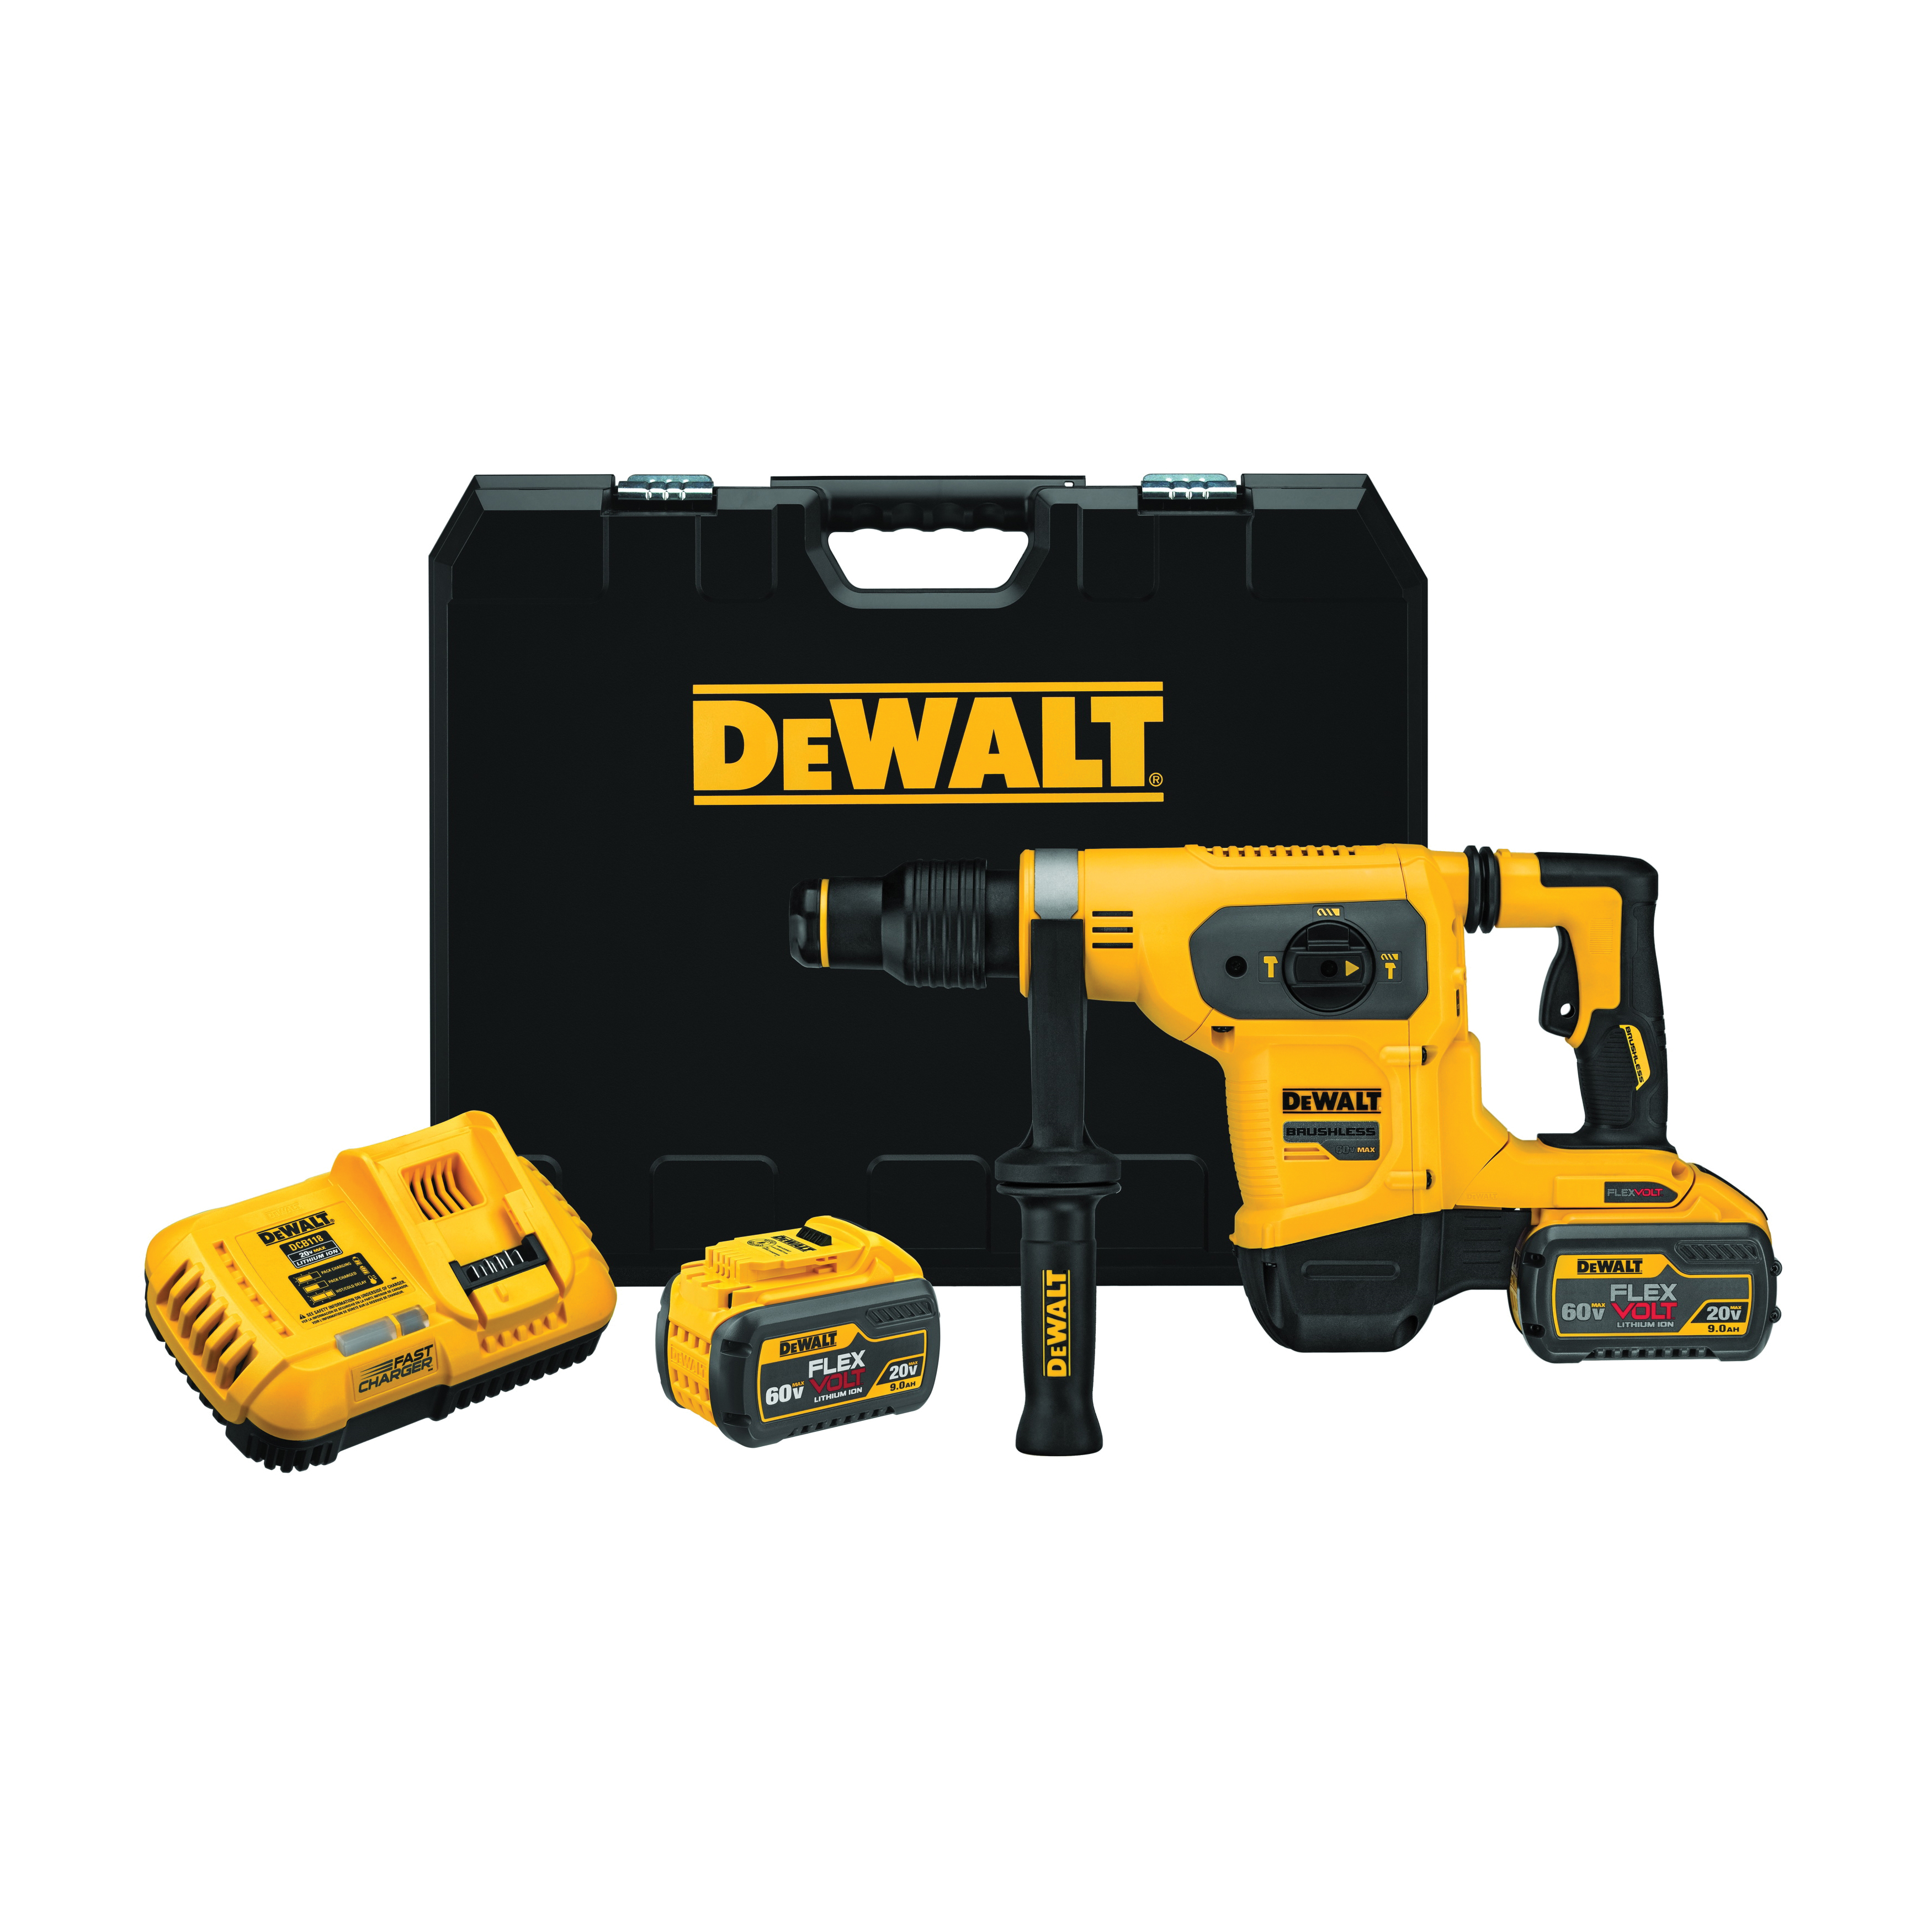 DeWALT® 60V MAX* FLEXVOLT™ DCH481X2 Cordless Combination Hammer Drill, 1 in SDS Max® Chuck, 60 V, 540 rpm No-Load, Lithium-Ion Battery